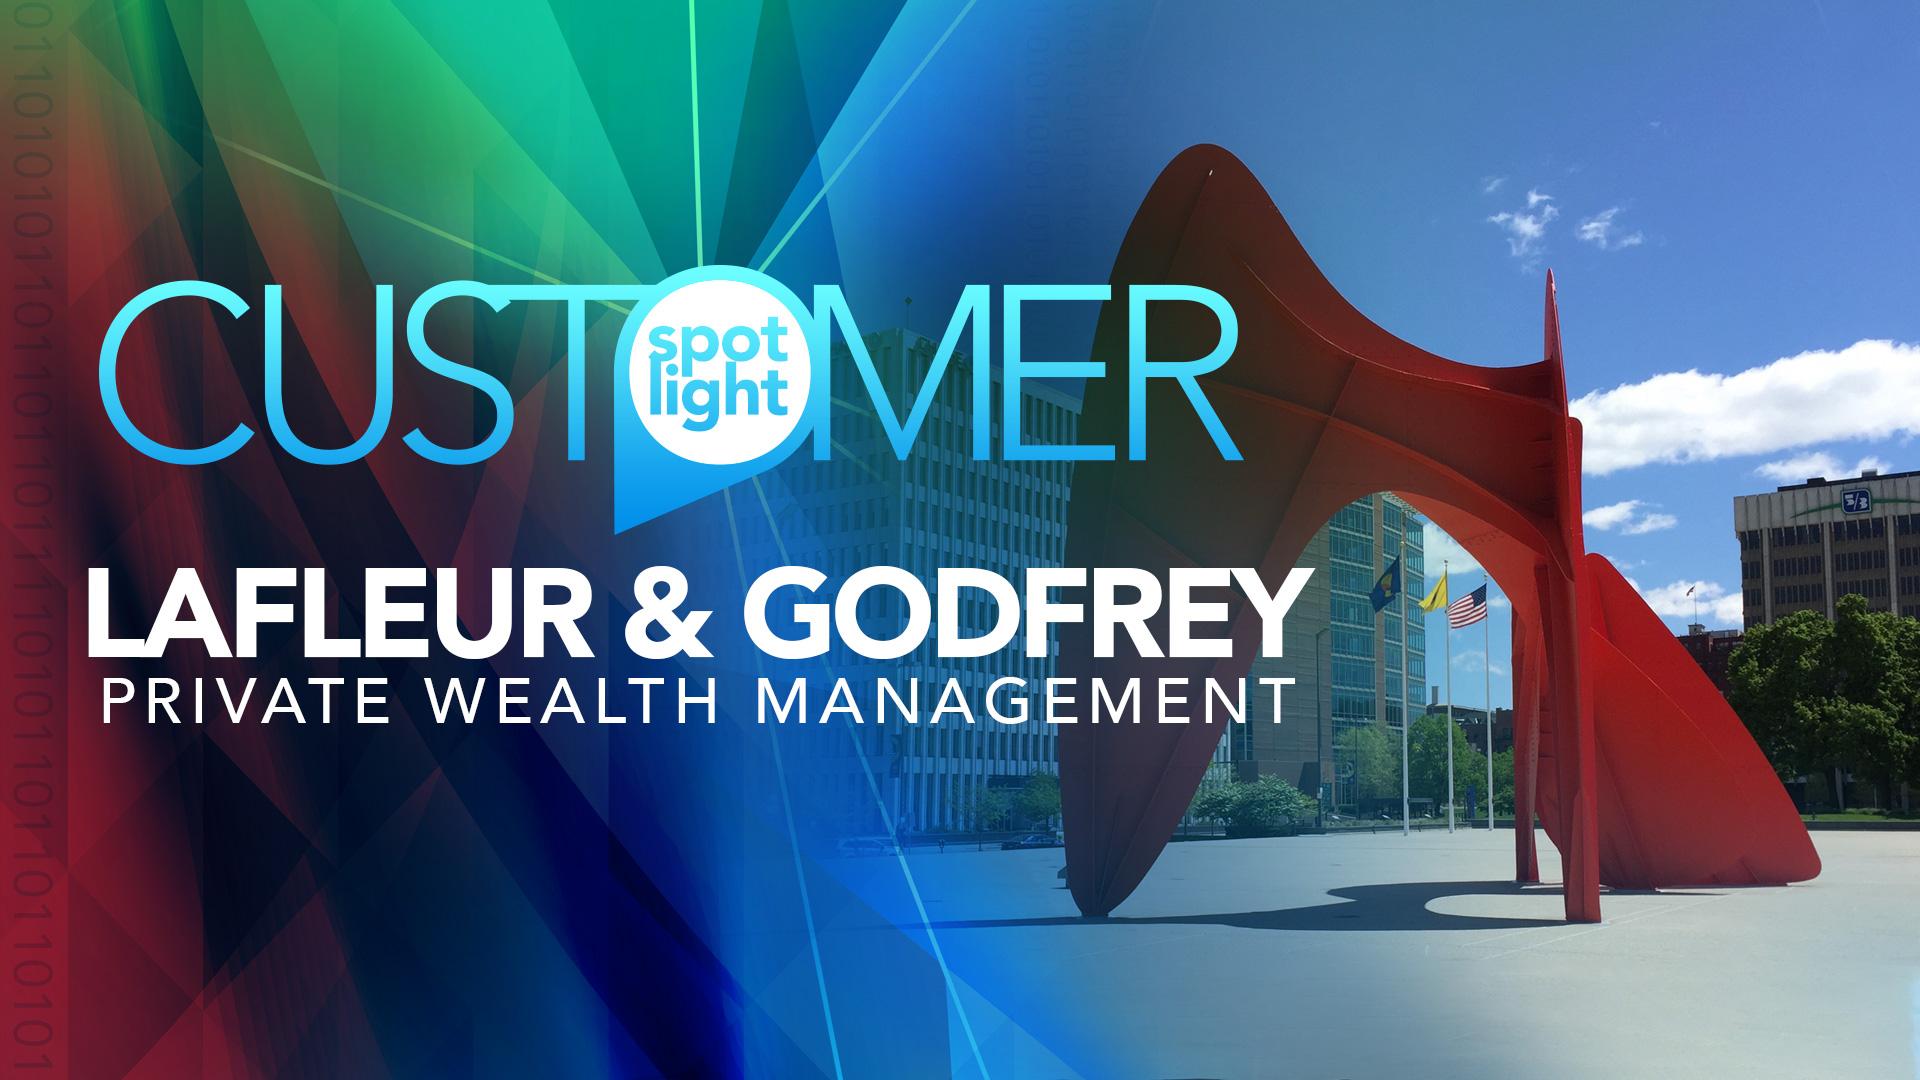 Customer Spotlight—LaFleur & Godfrey